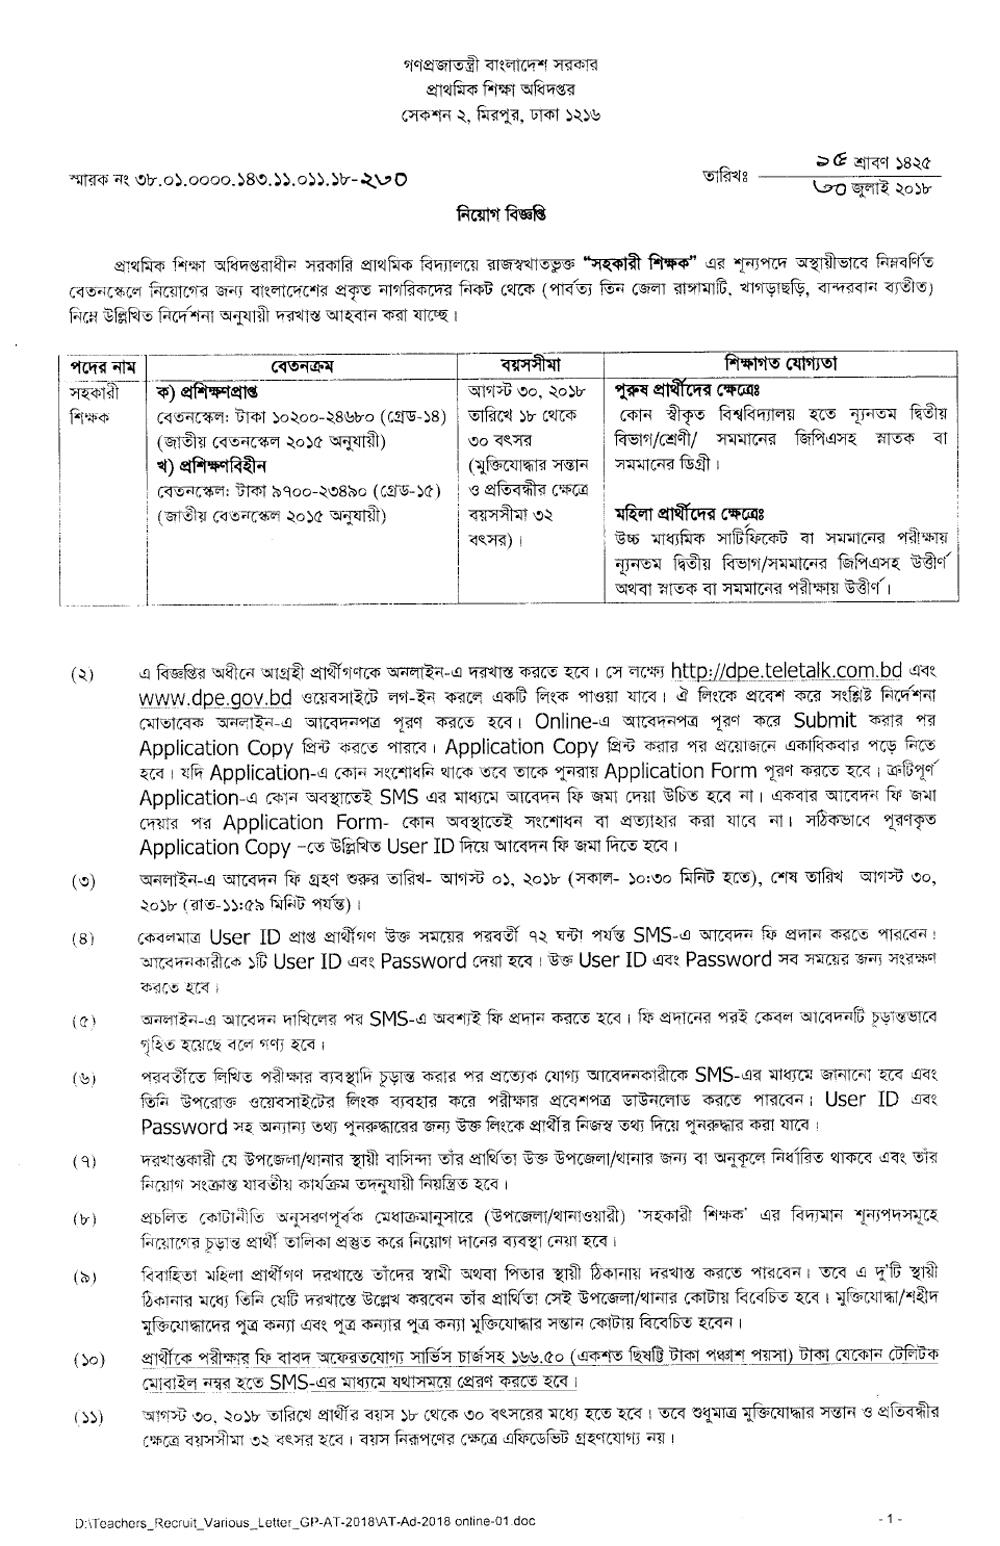 WWW DPE BD - Primary Assistant Teacher Bangladesh Job Application